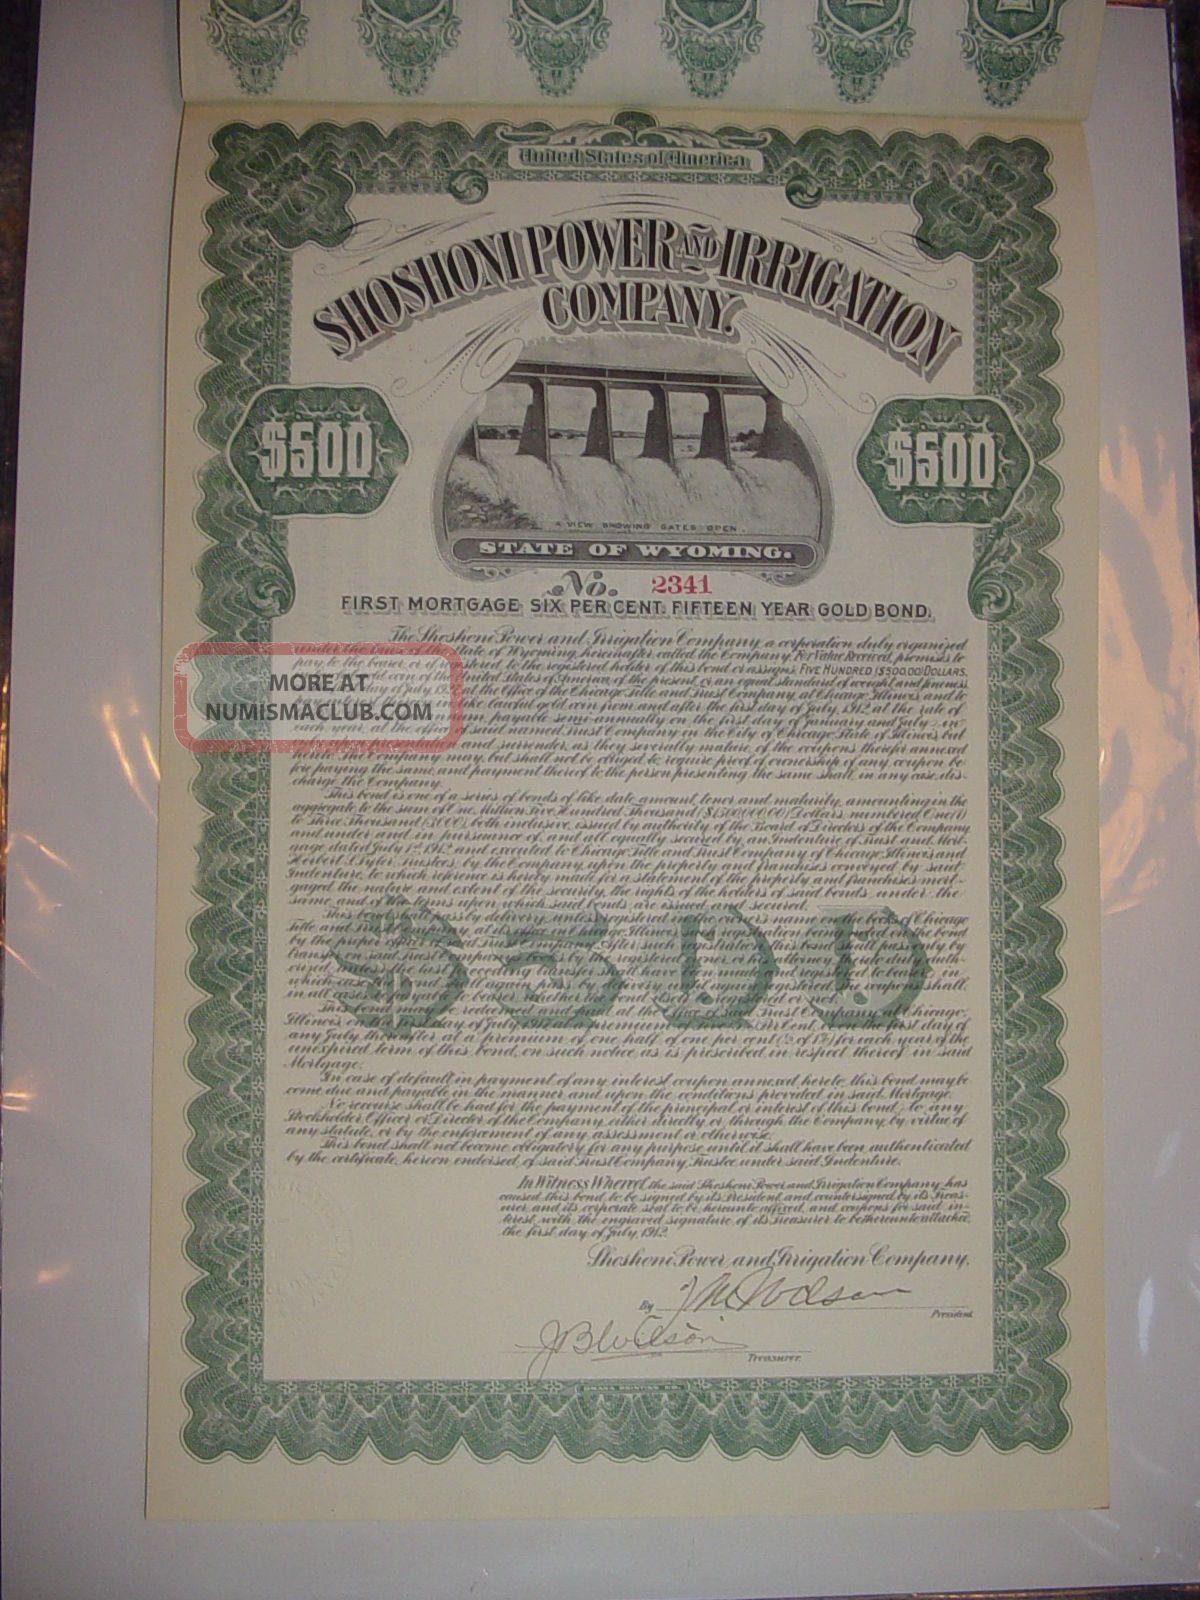 Shoshoni Power & Irrigation Company Bond Stock Certificate Wyoming Stocks & Bonds, Scripophily photo